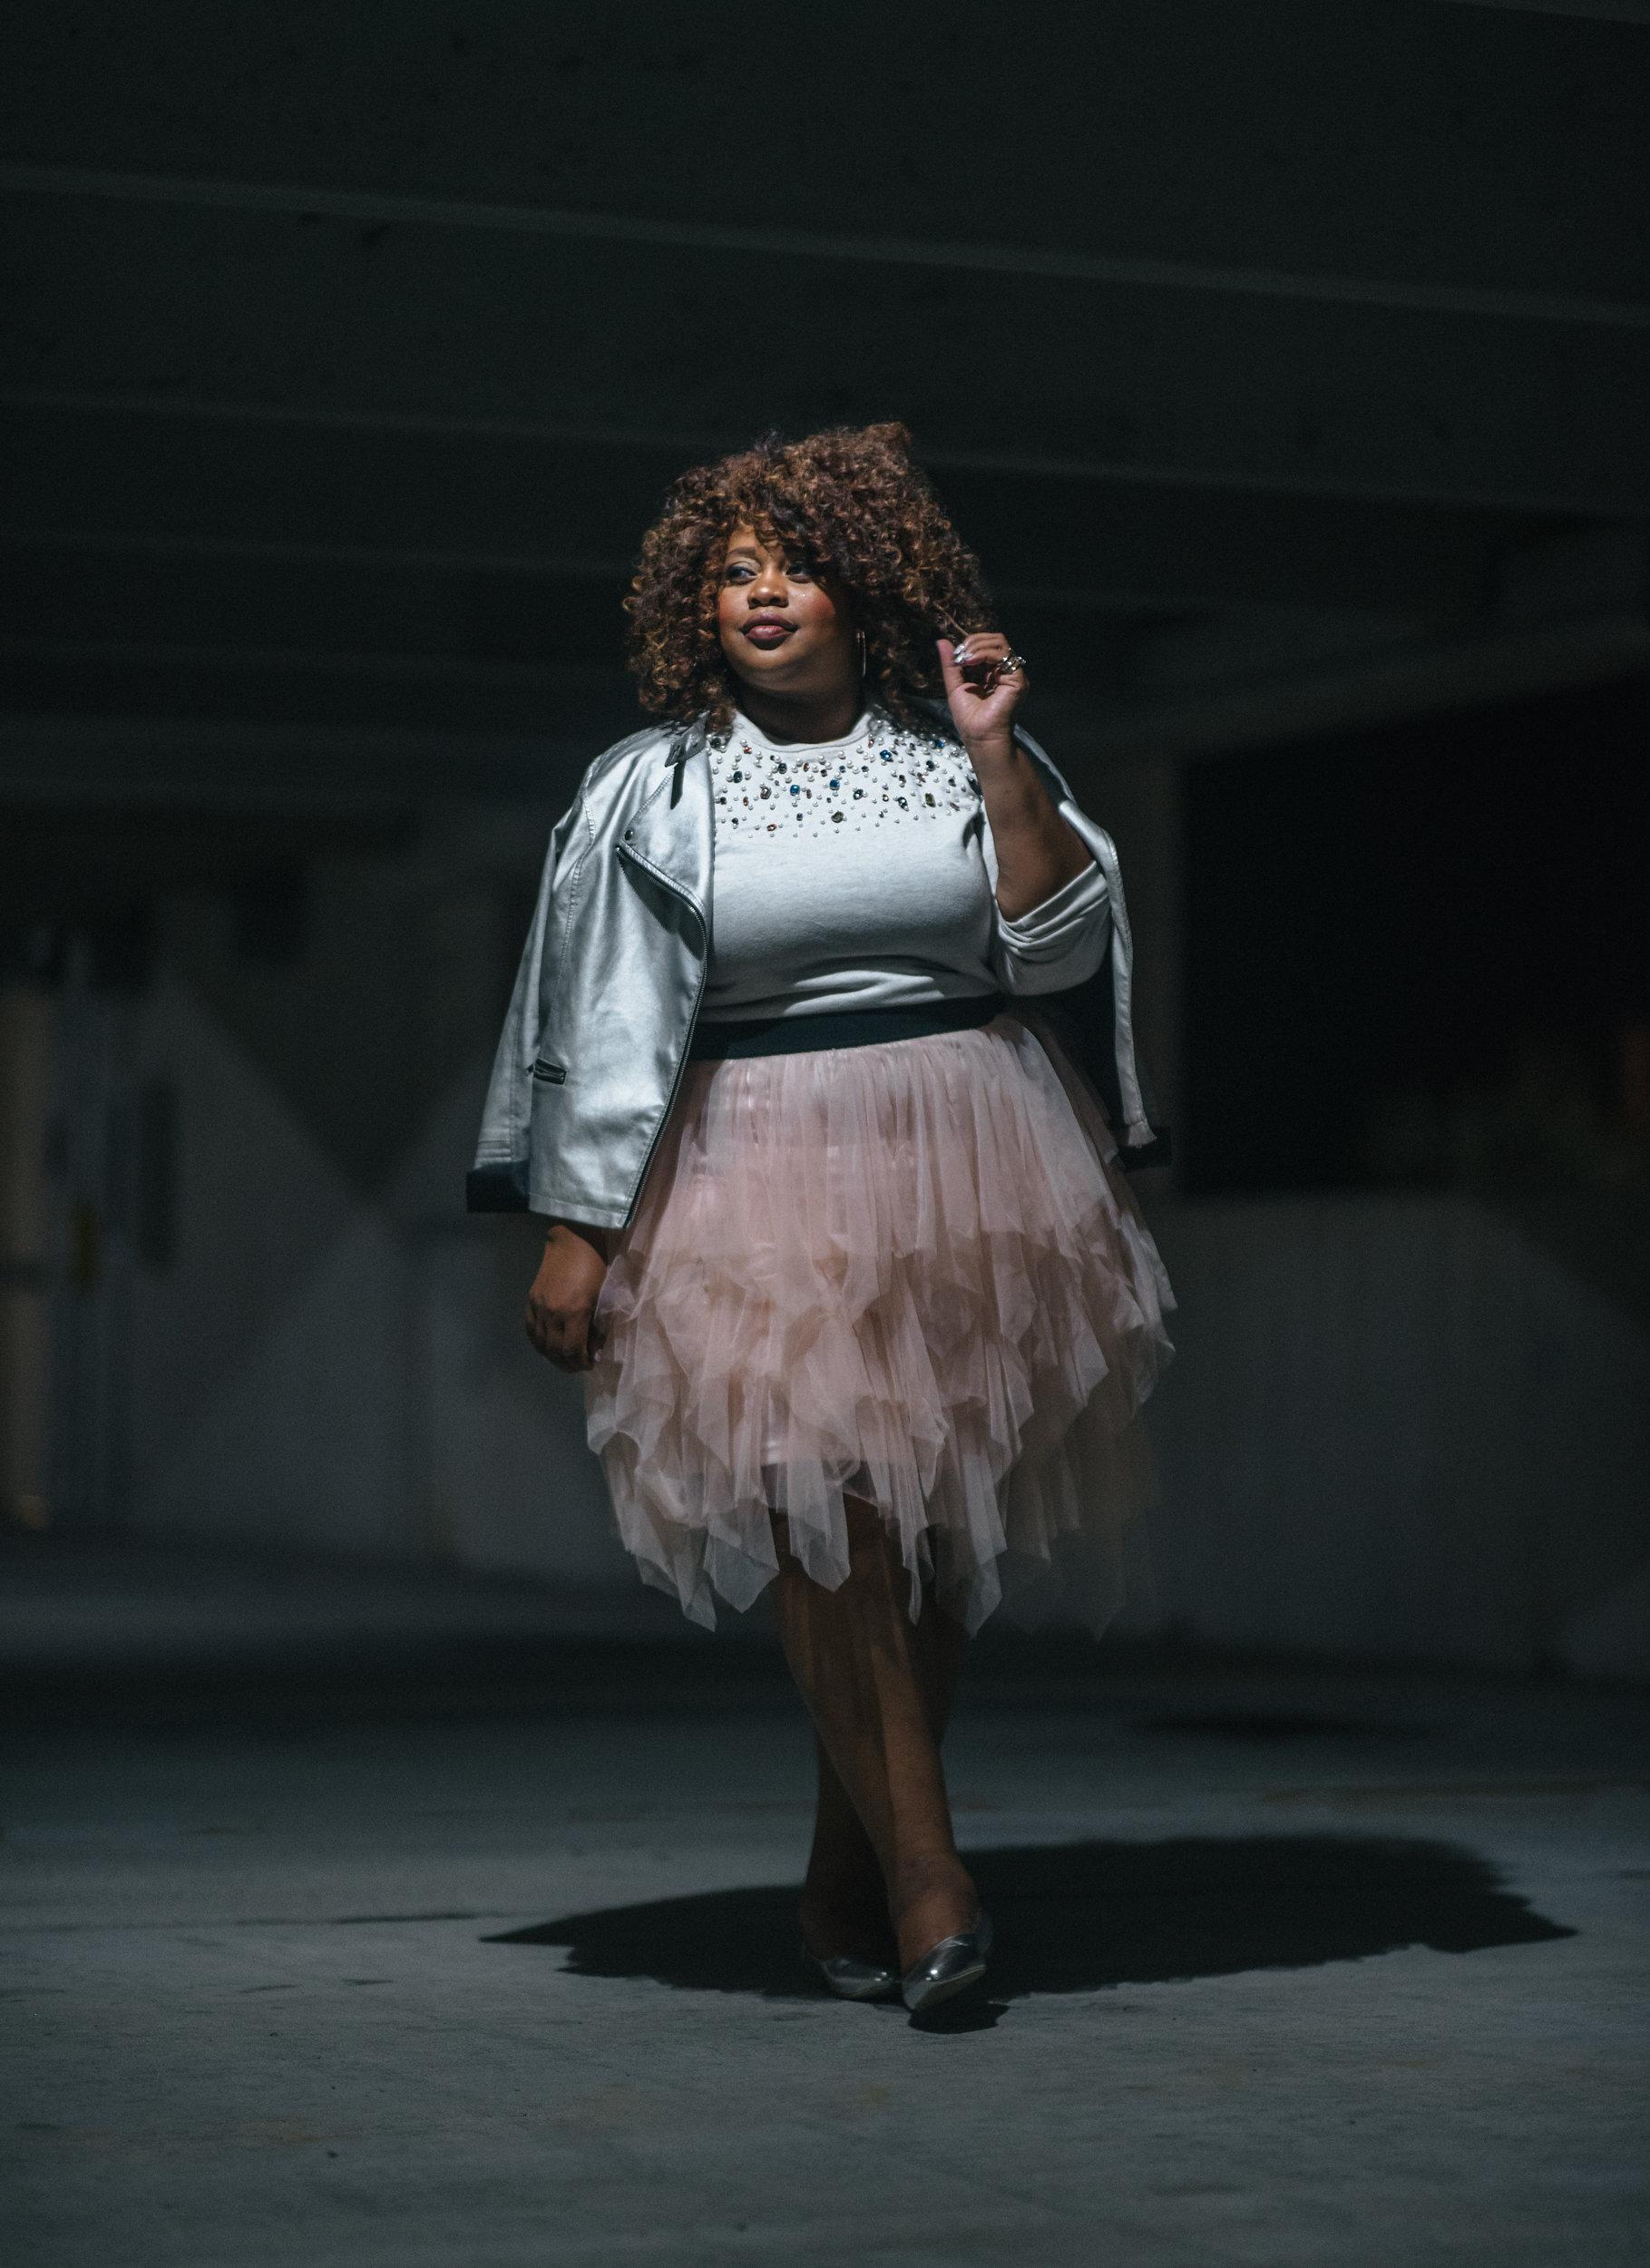 Sabrina Servance Model Monday